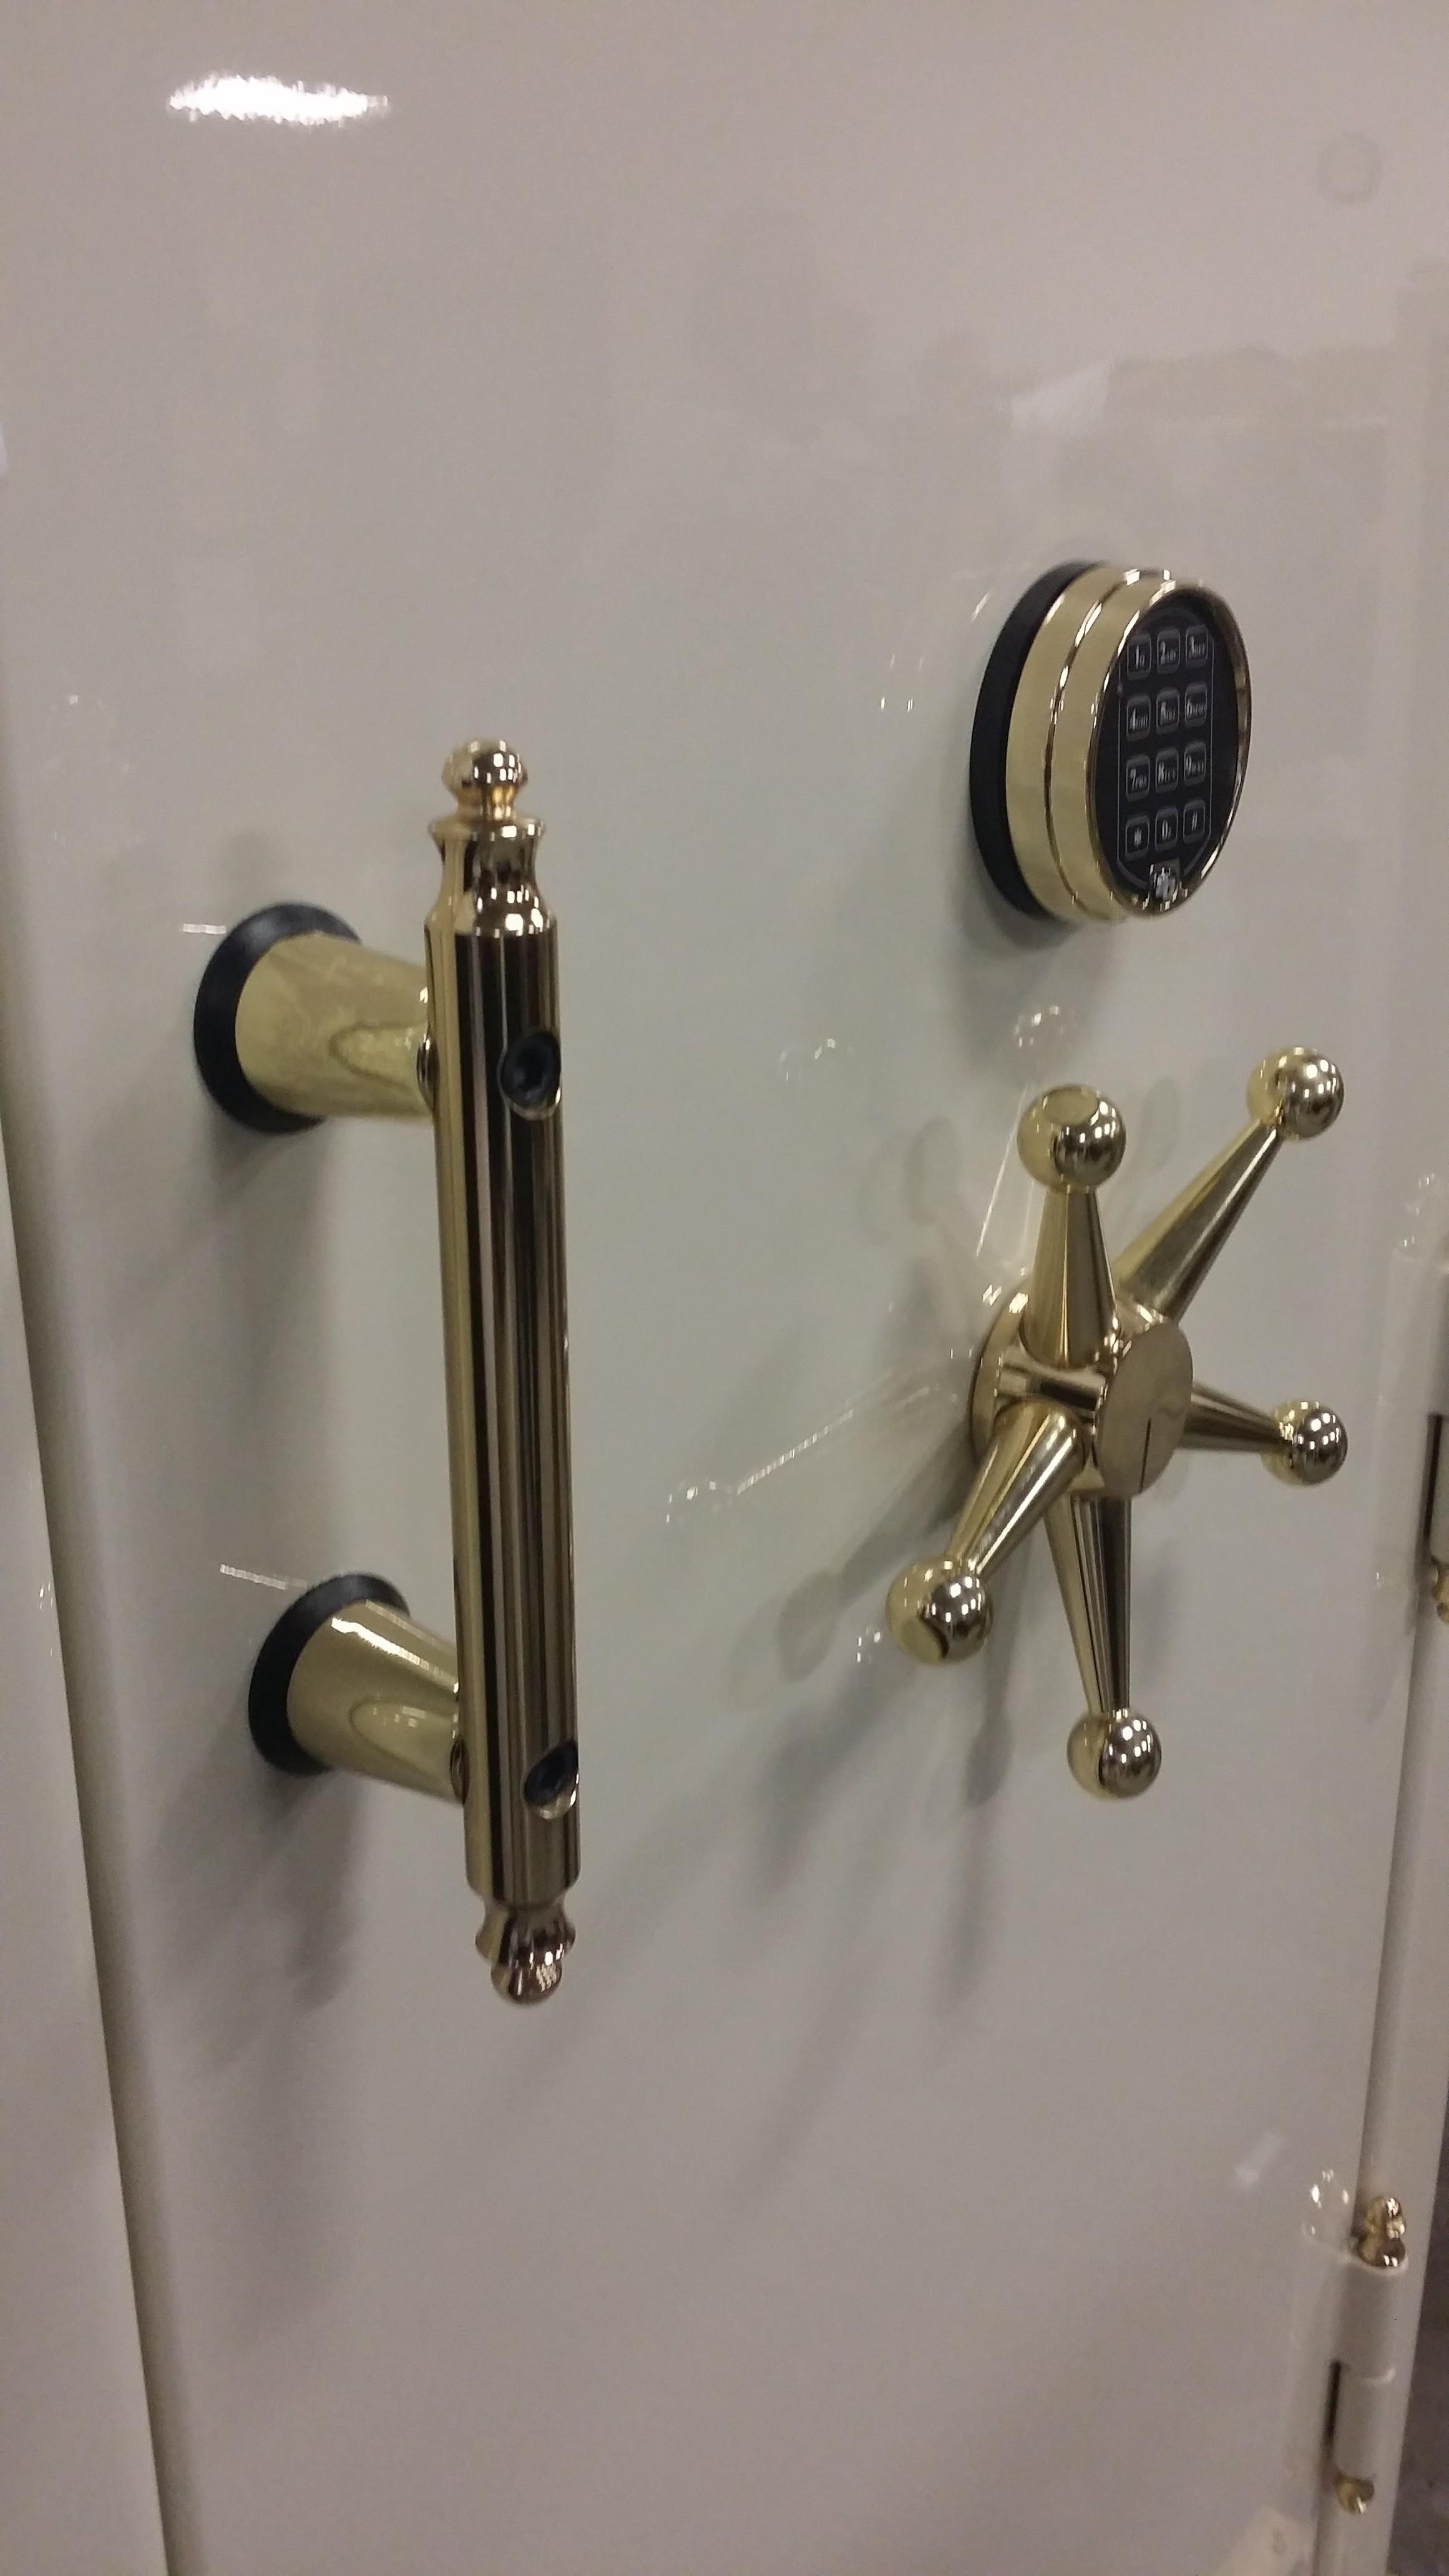 Fort Knox Defender Series Gun Safe - The Safe House Store